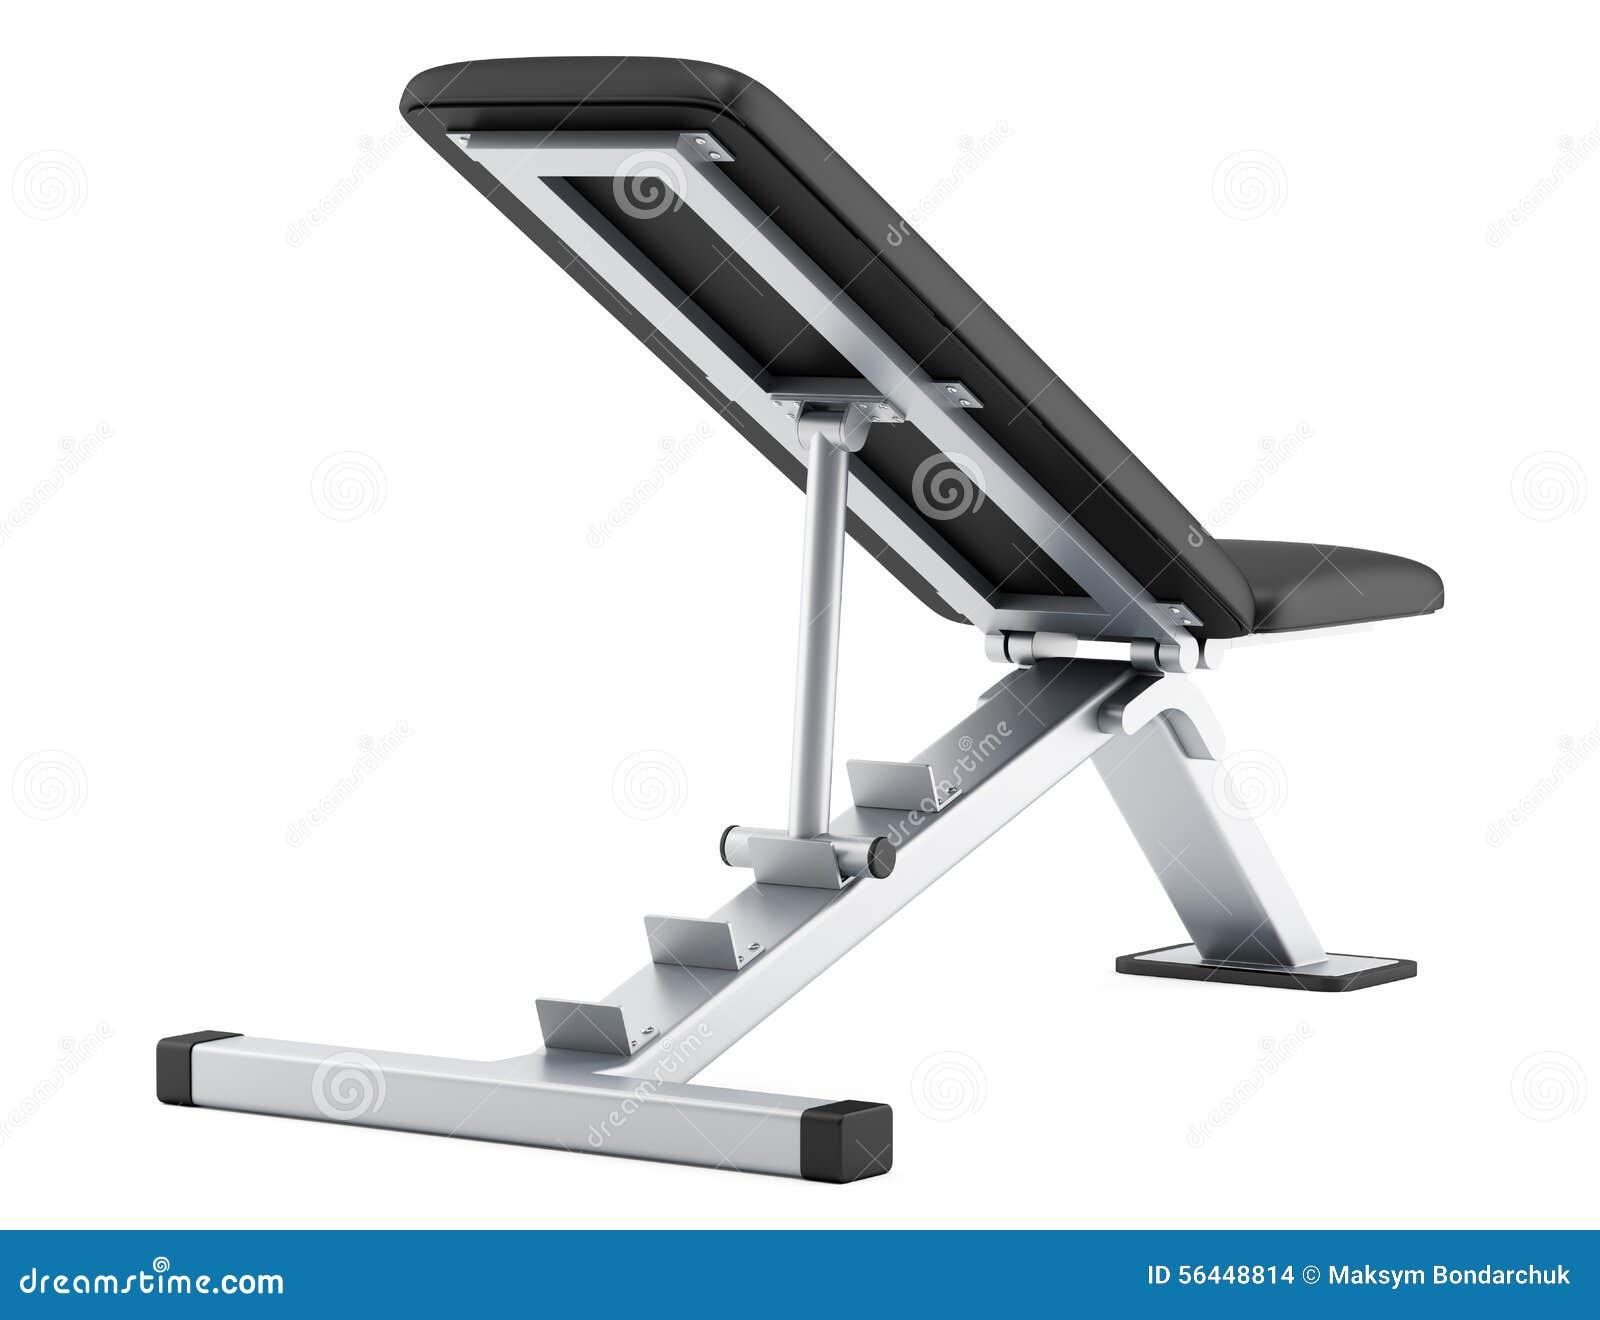 Adjustable Gym Bench Isolated On White Stock Illustration